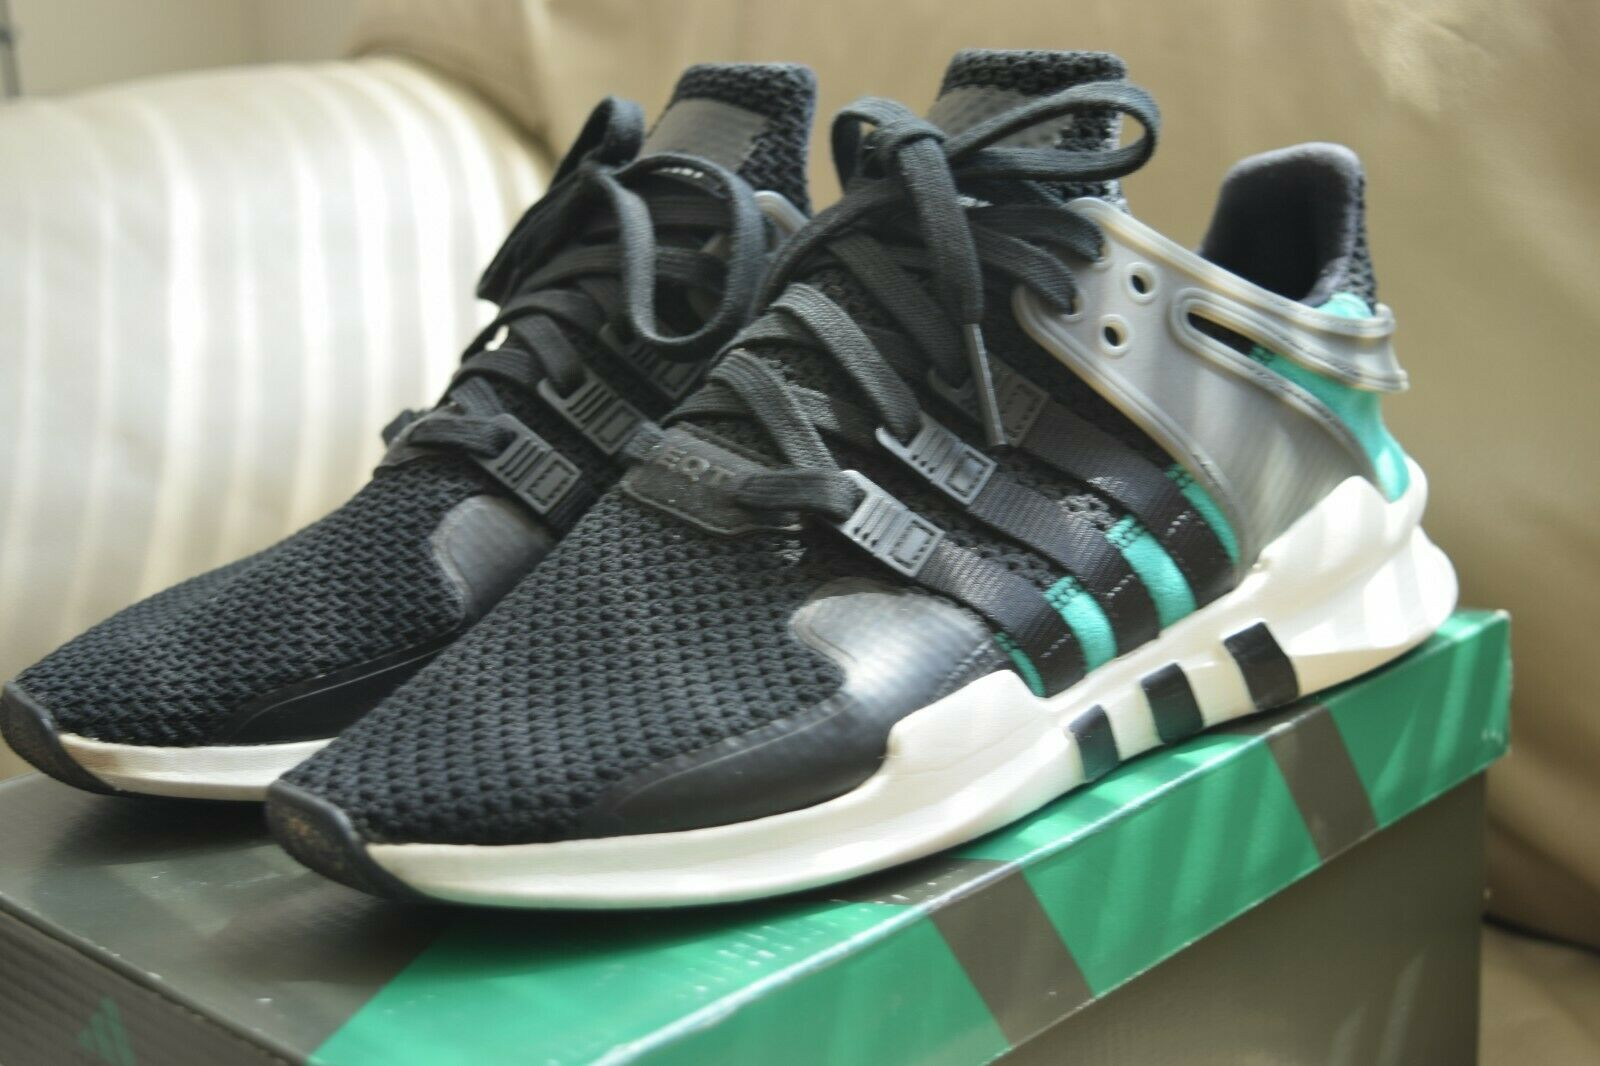 Adidas EQT Advan Support Sub Green Size 8